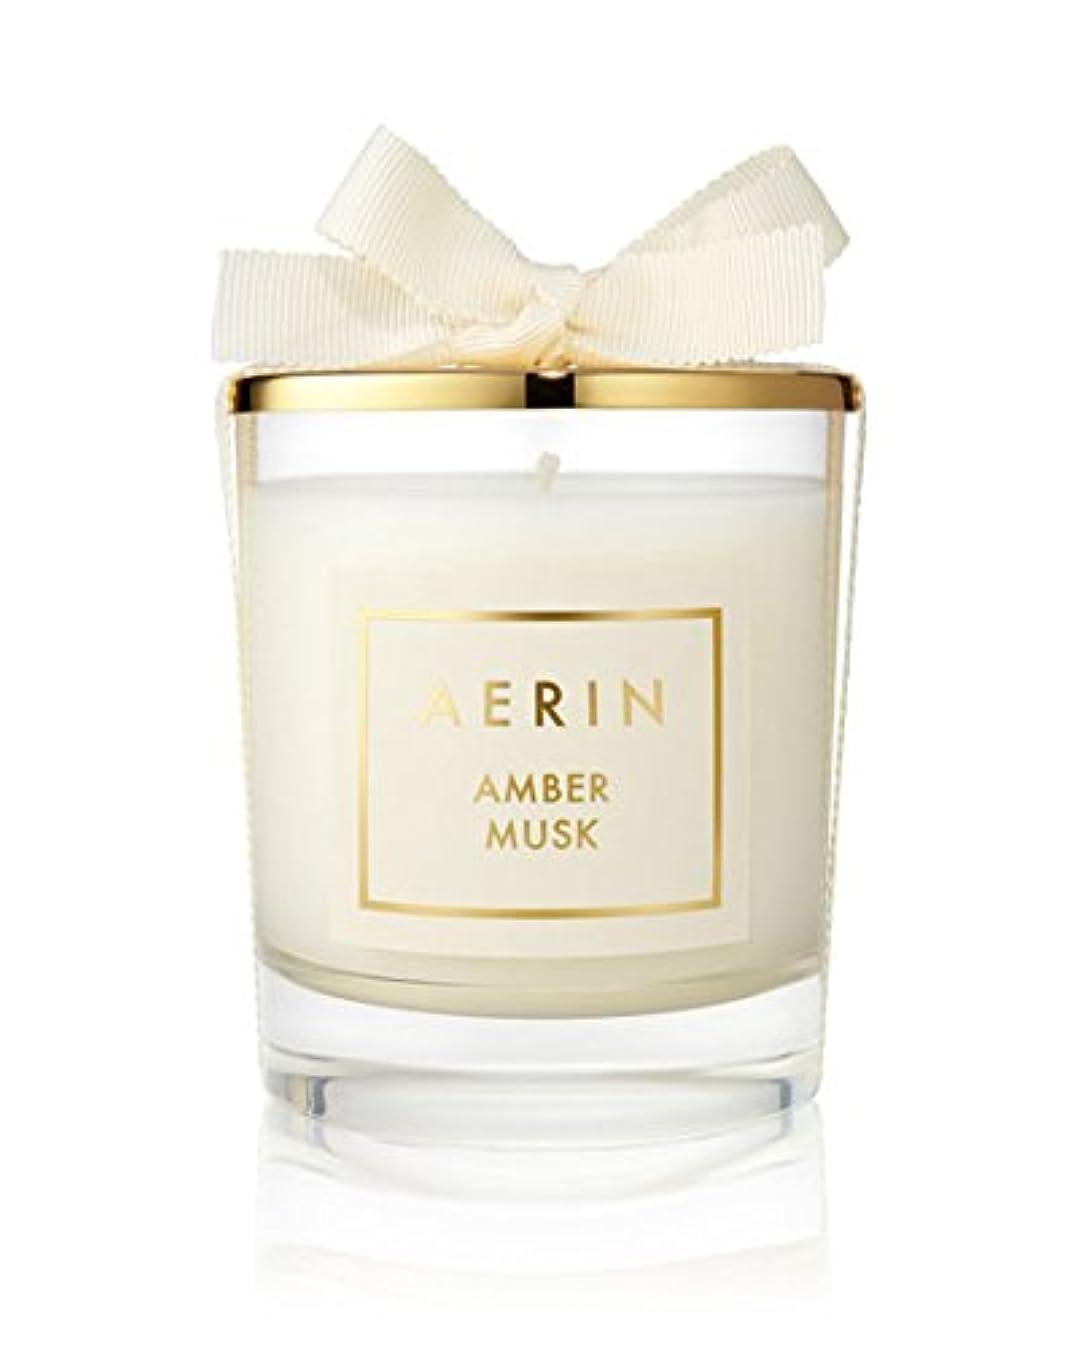 AERIN AmberムスクCandle 7オンス/ 200?g Limited Edition